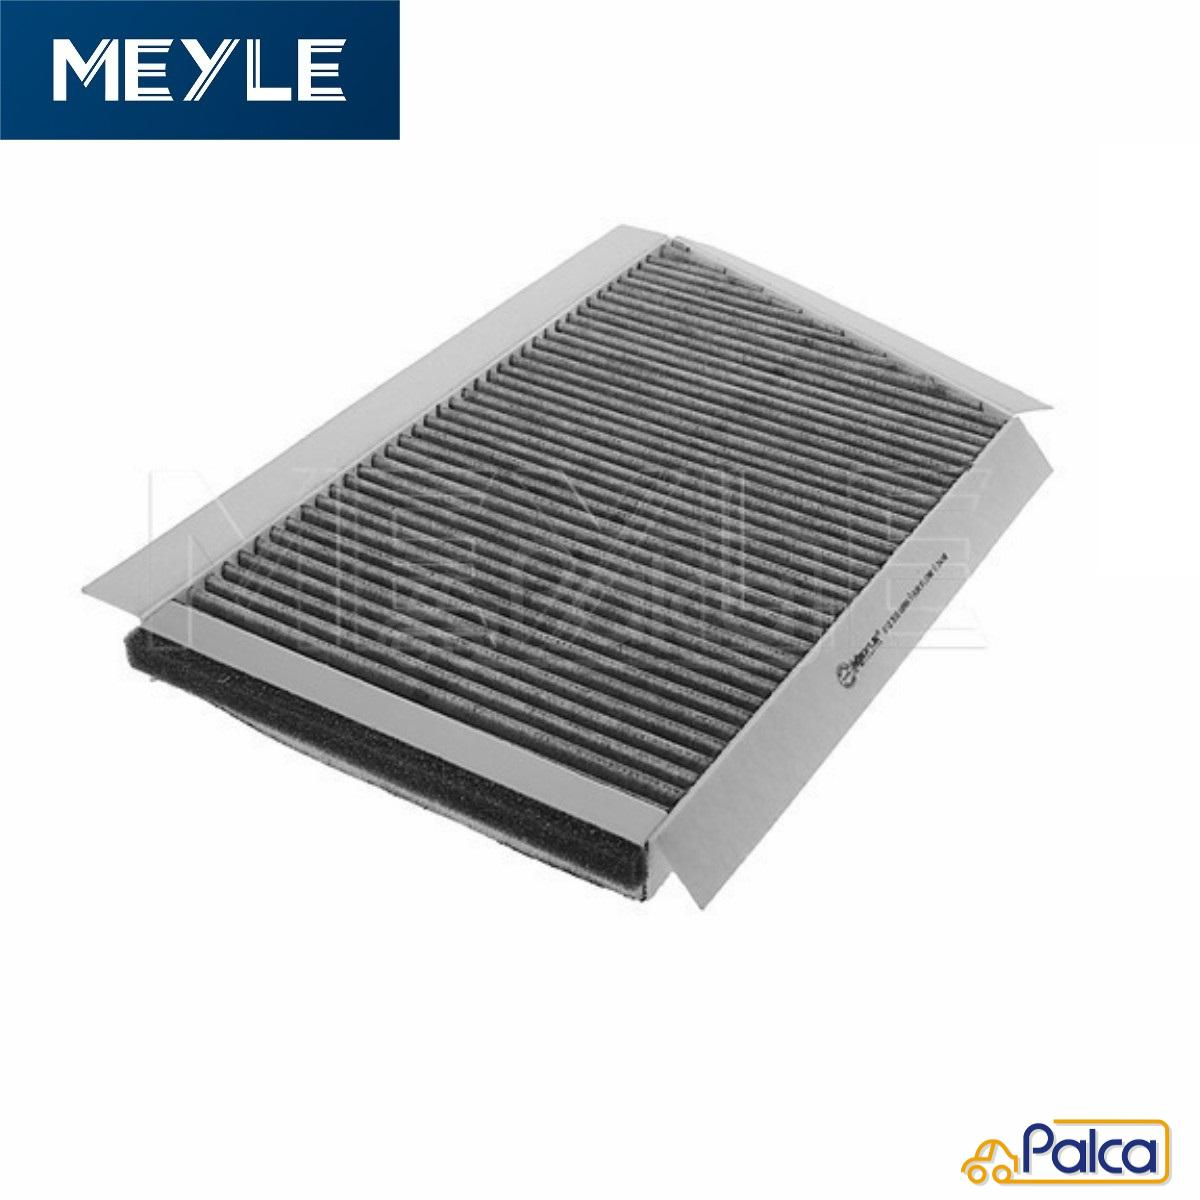 MEYLE製 新品 あす楽 公式ストア 国内即発送 メルセデス ベンツ キャビン エアコンフィルター 209 マイレ製 外気用 右H 活性炭入り W203